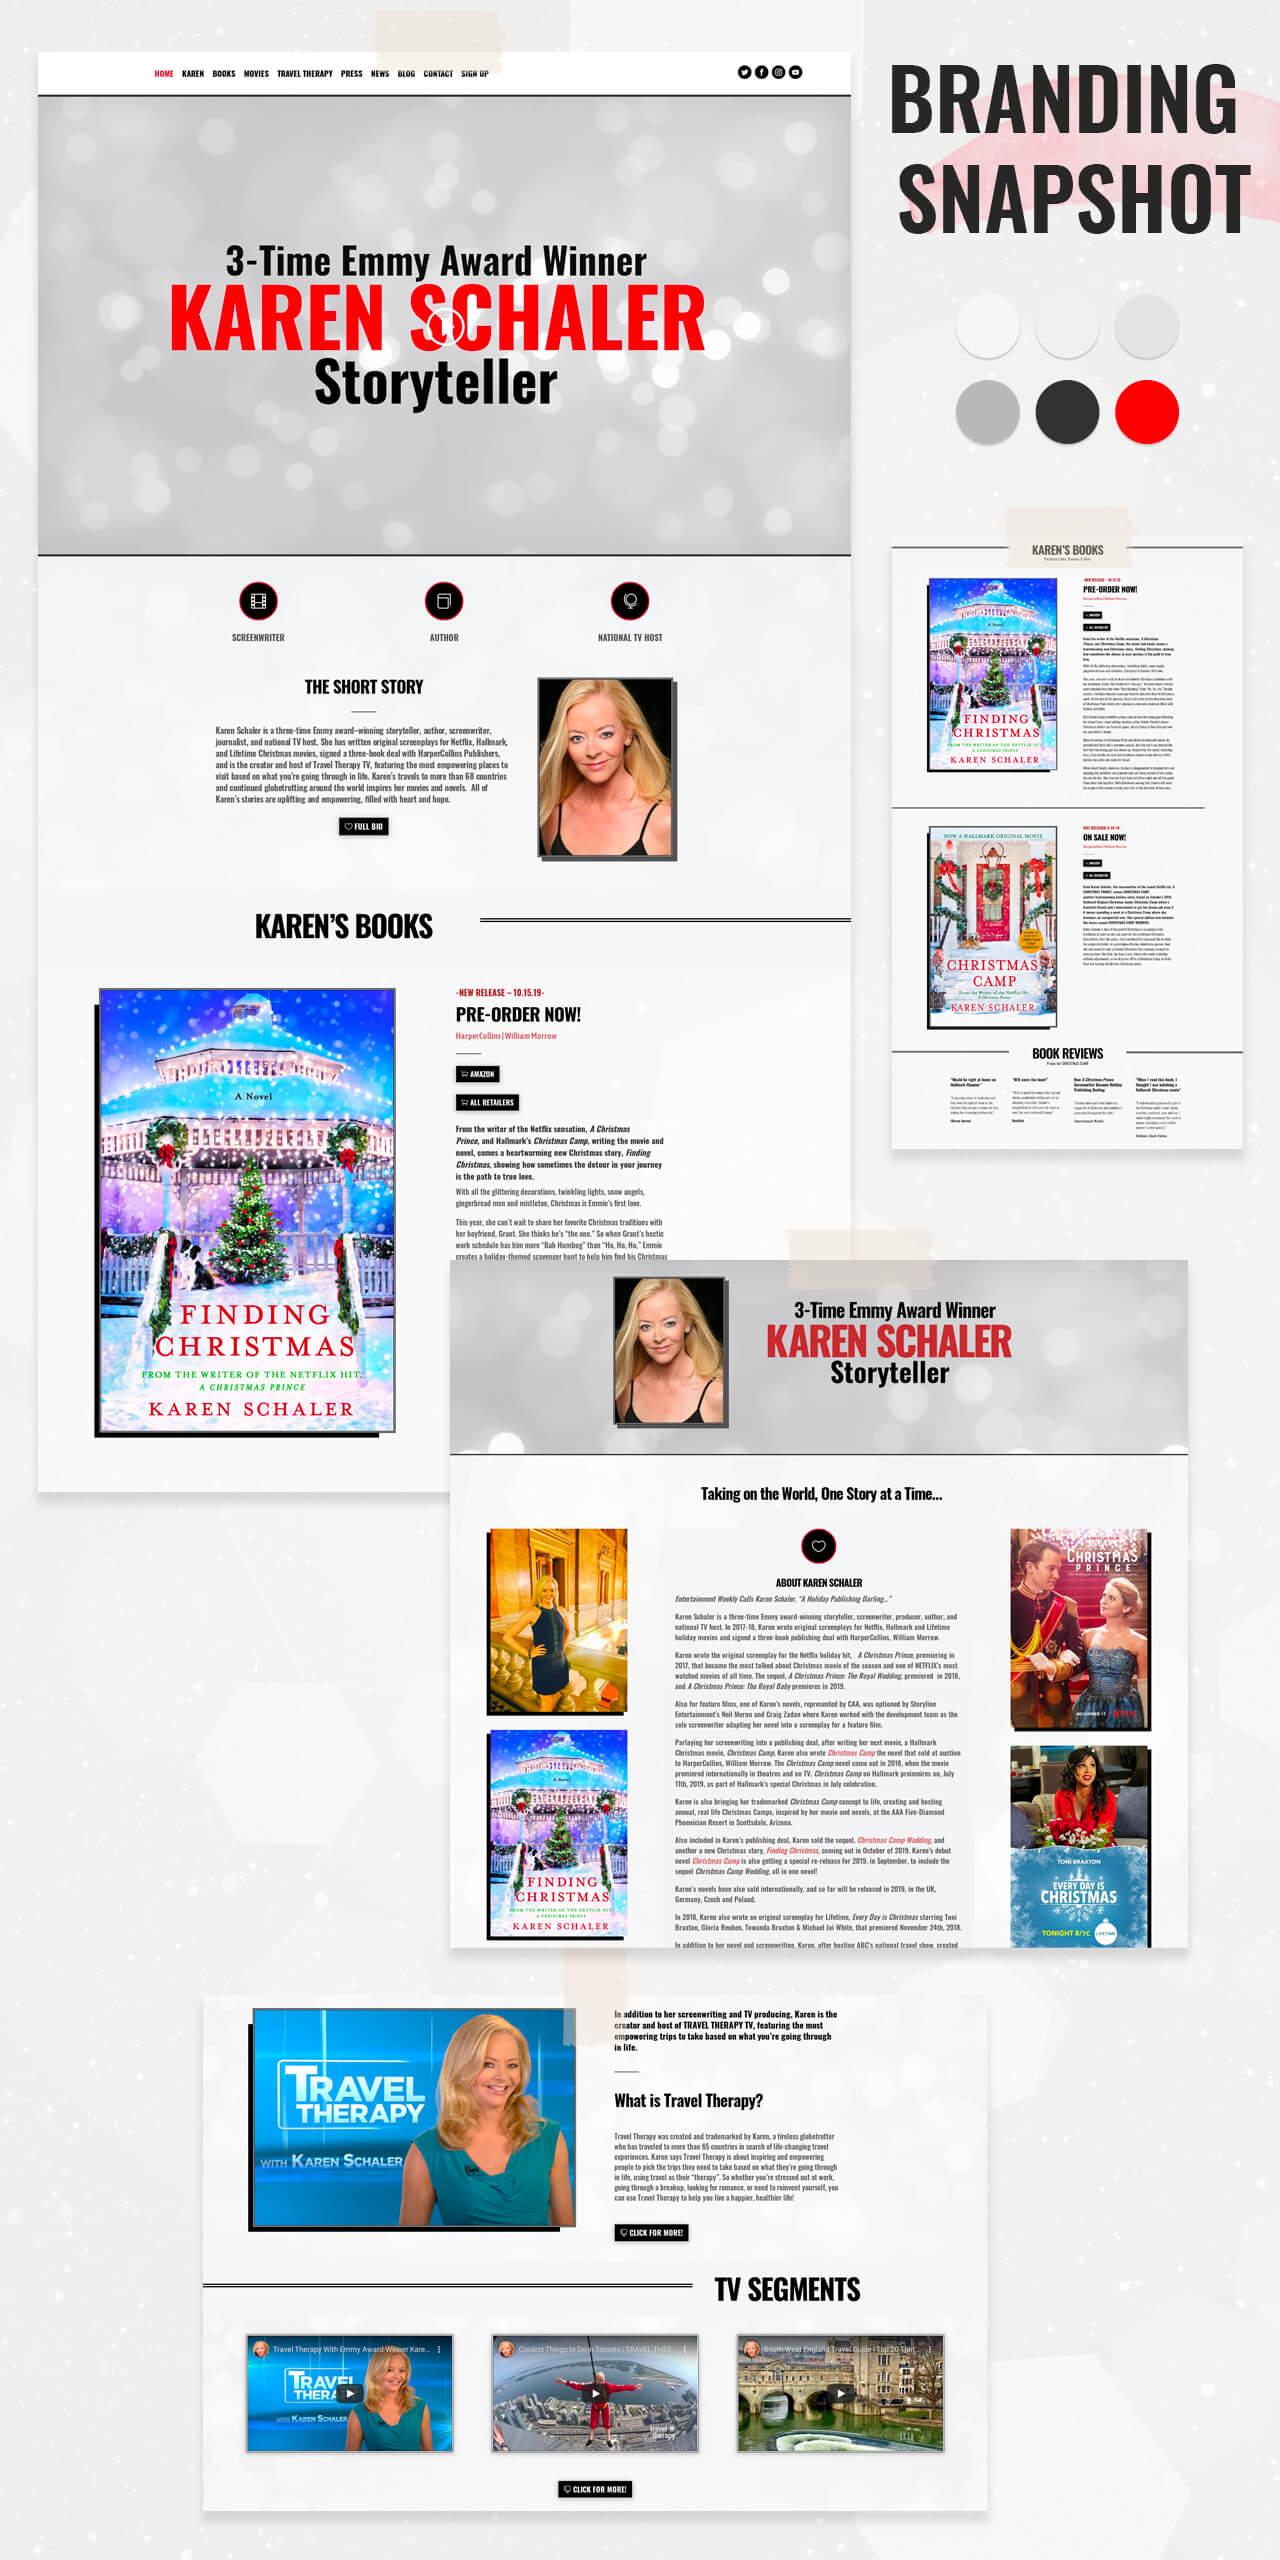 Website for 3-Time Emmy Award Winner Karen Schaler